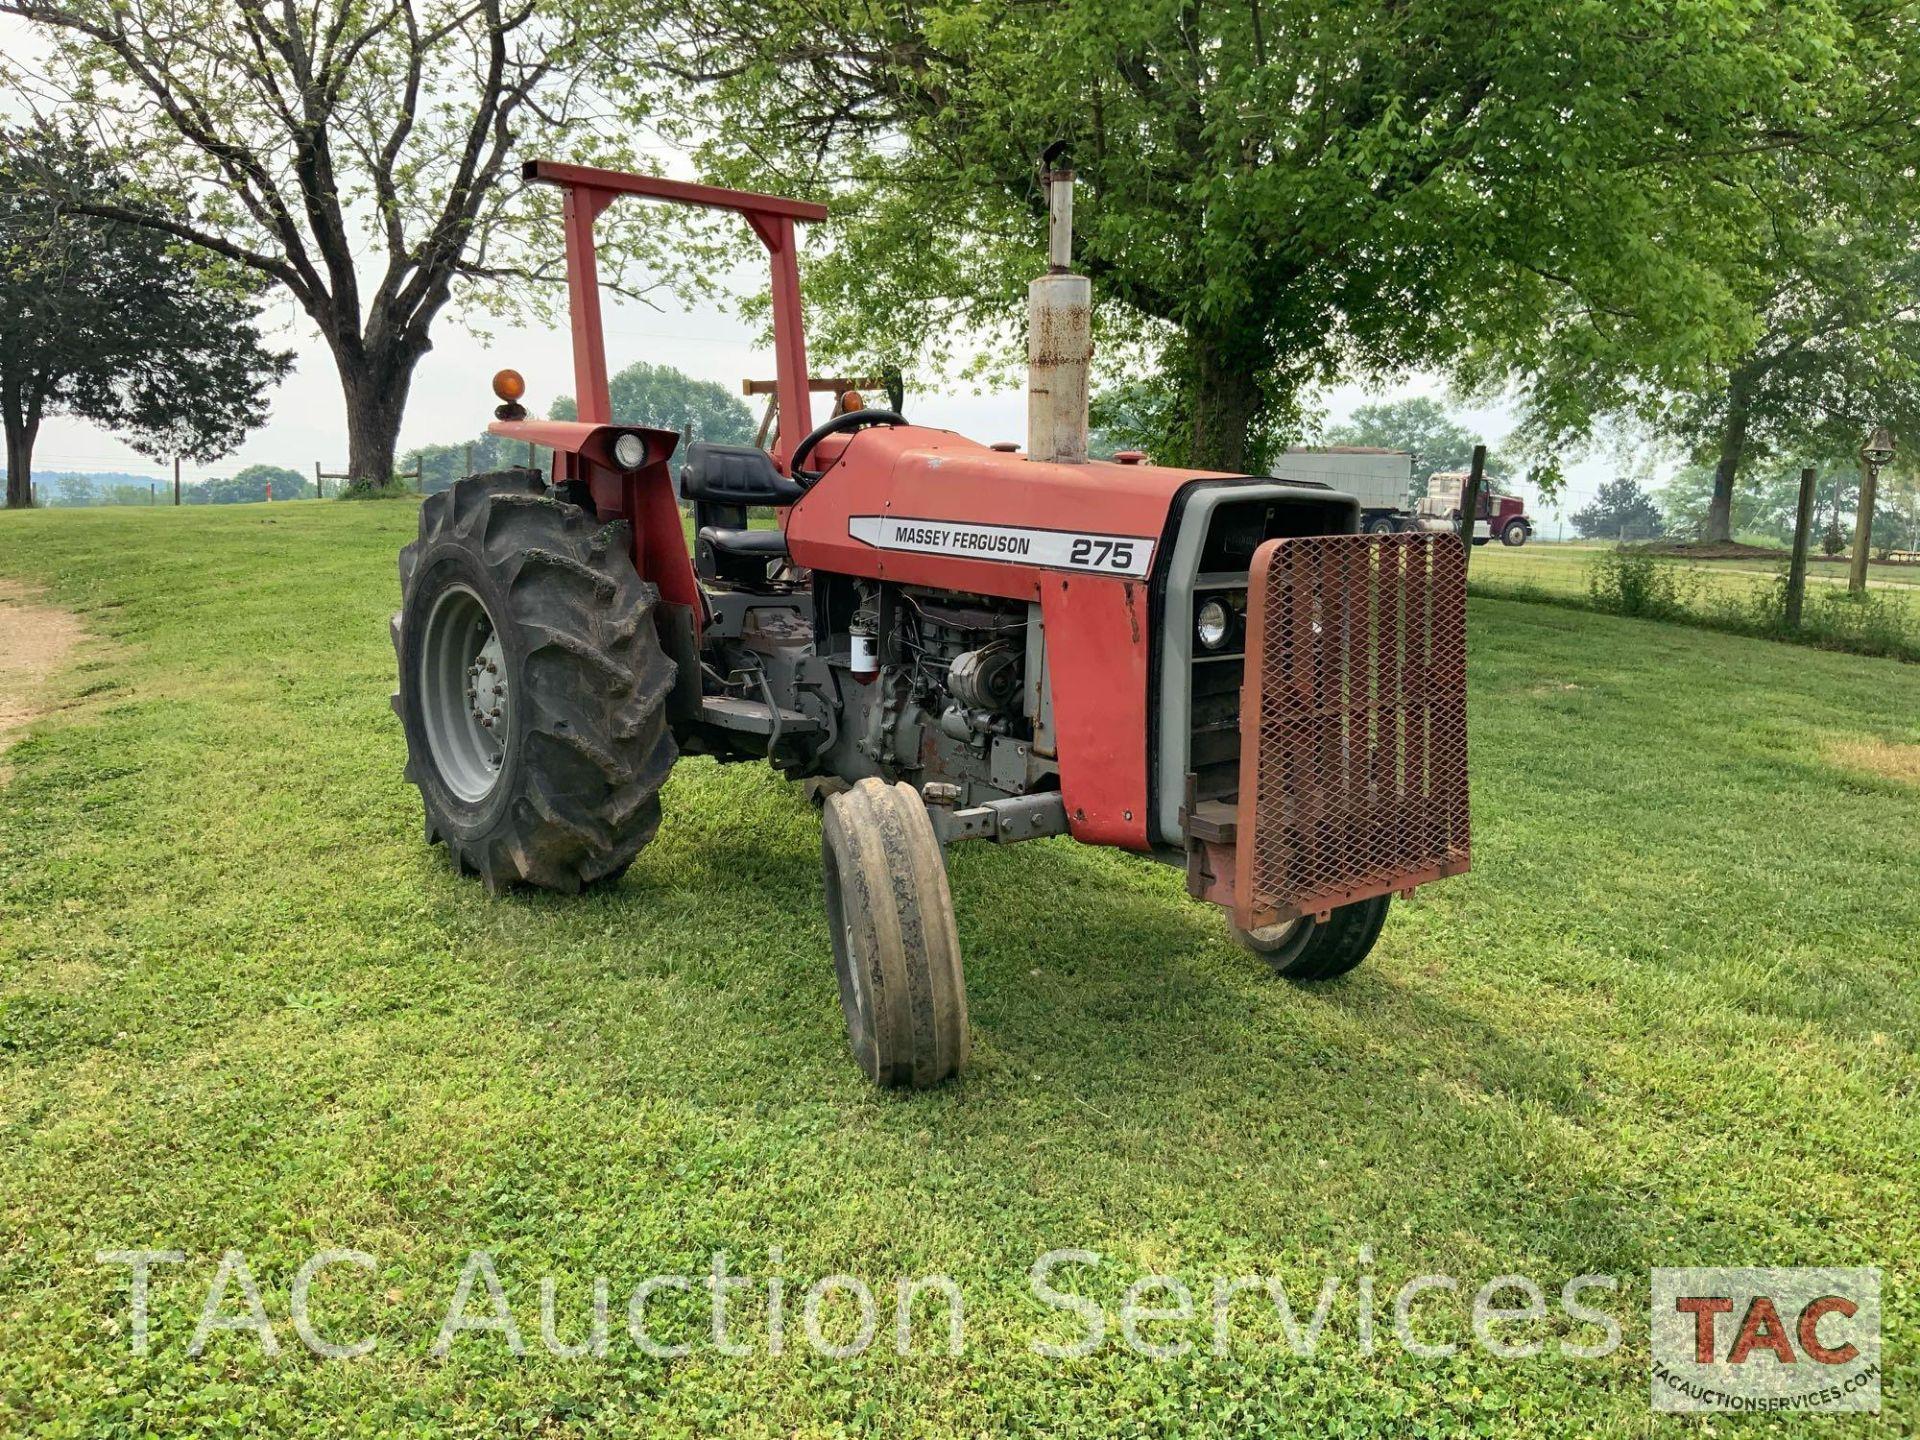 Massey Ferguson 275 Farm Tractor - Image 6 of 25